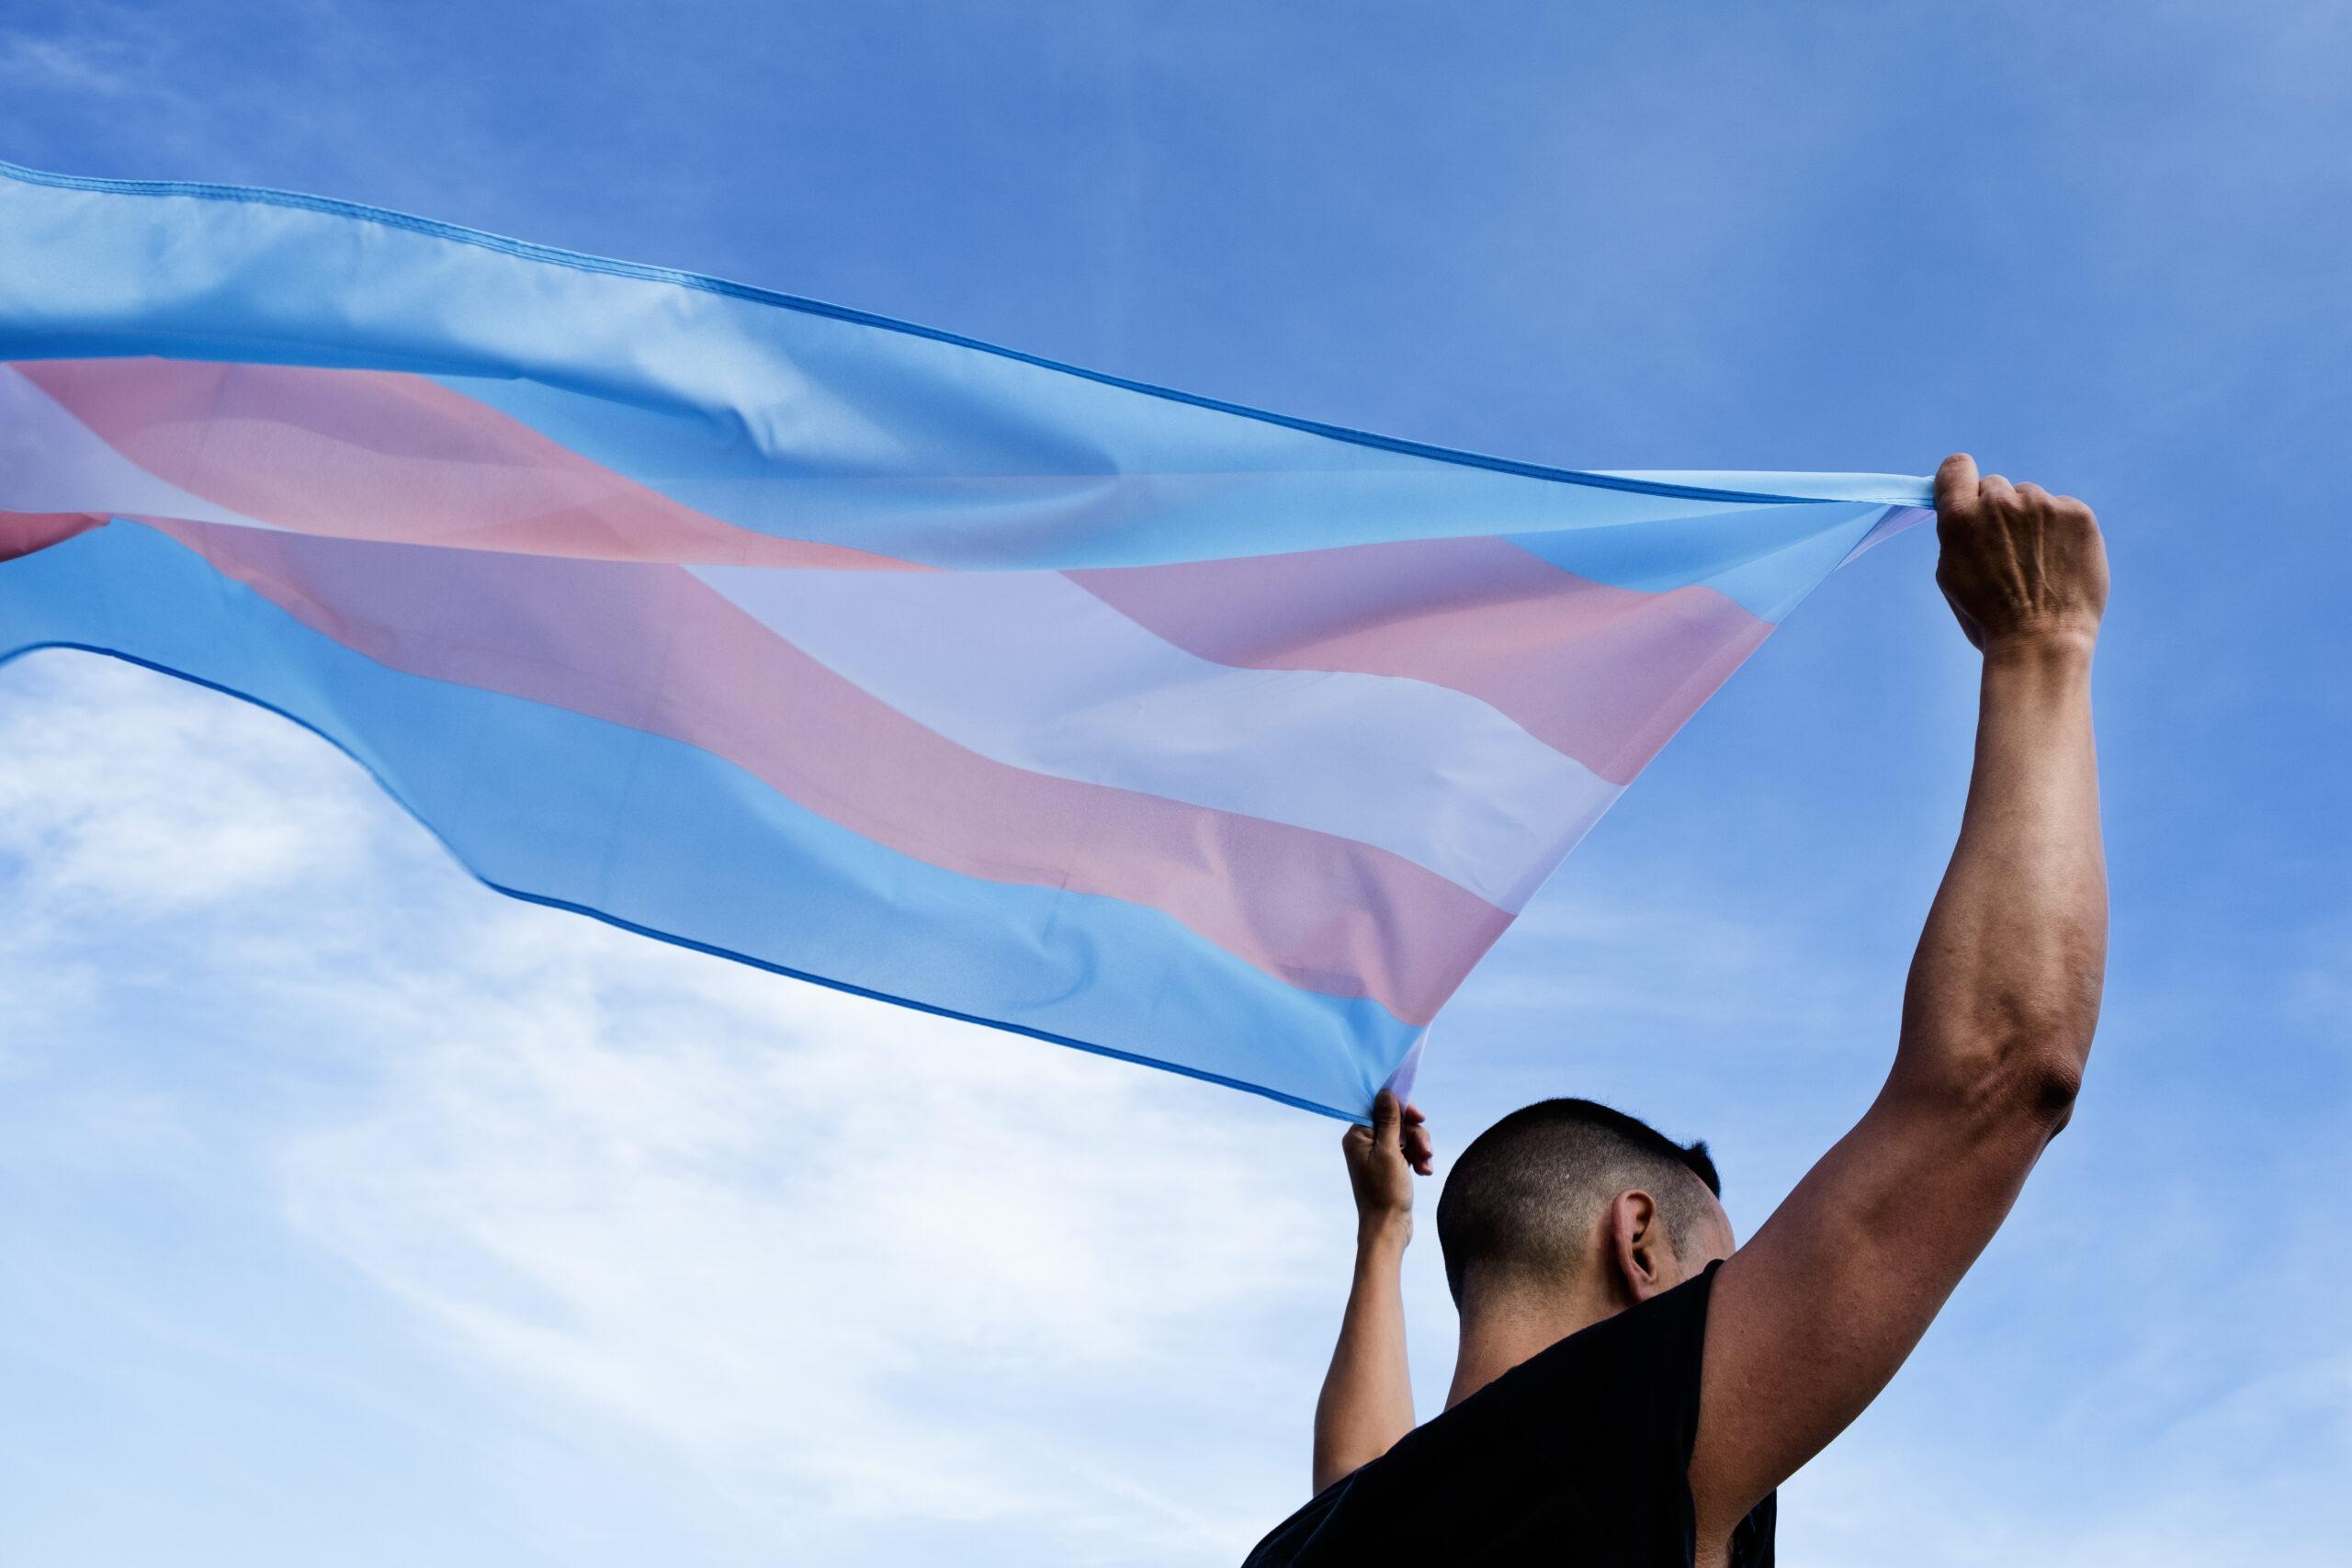 Honoring Transgender Day of Remembrance (TDOR) and Trans Awareness Week